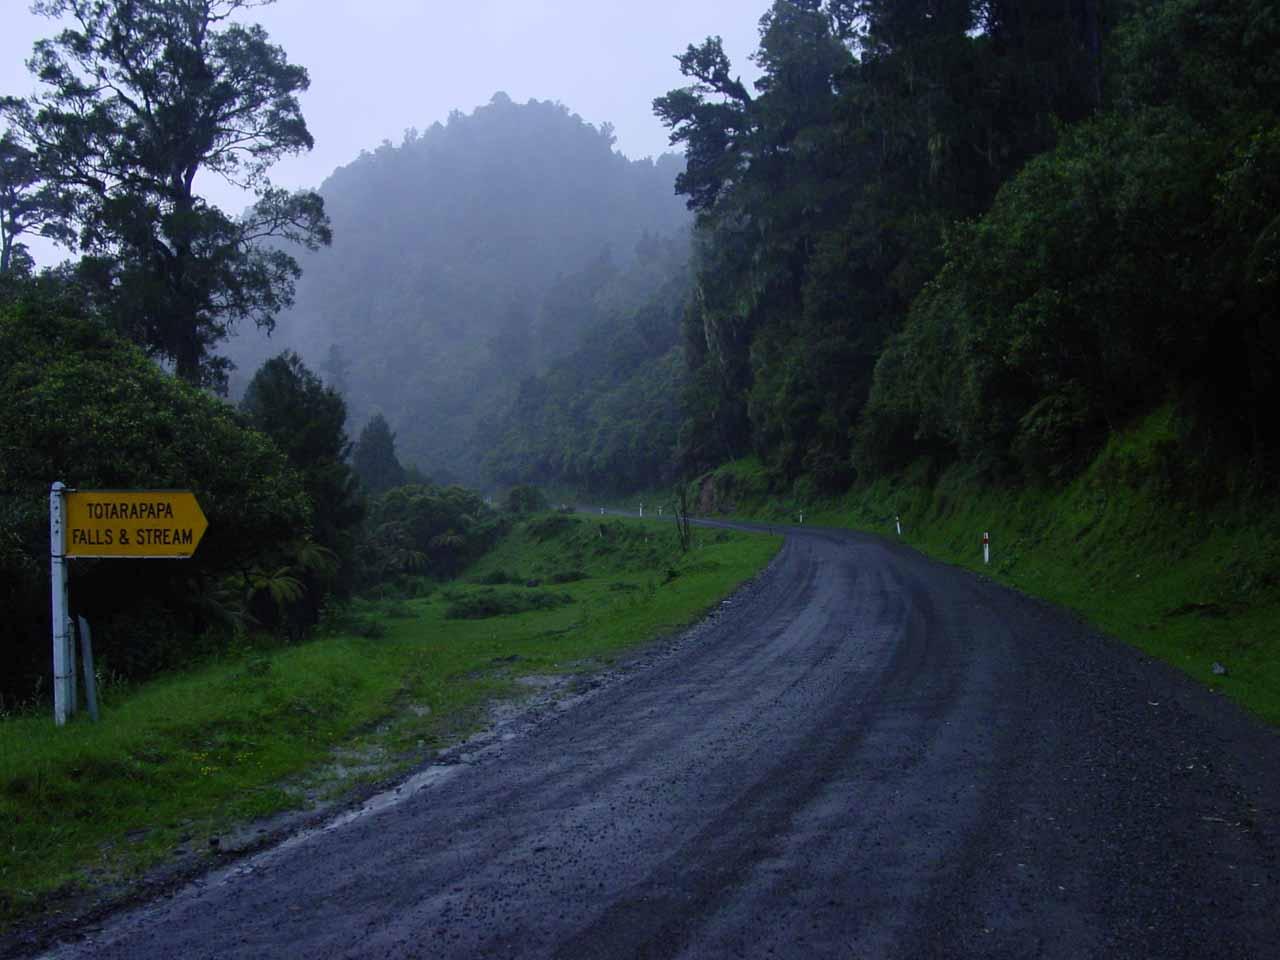 Along the way to Mokau Falls, we also ran across this signpost tipping us off to Totarapapa Falls